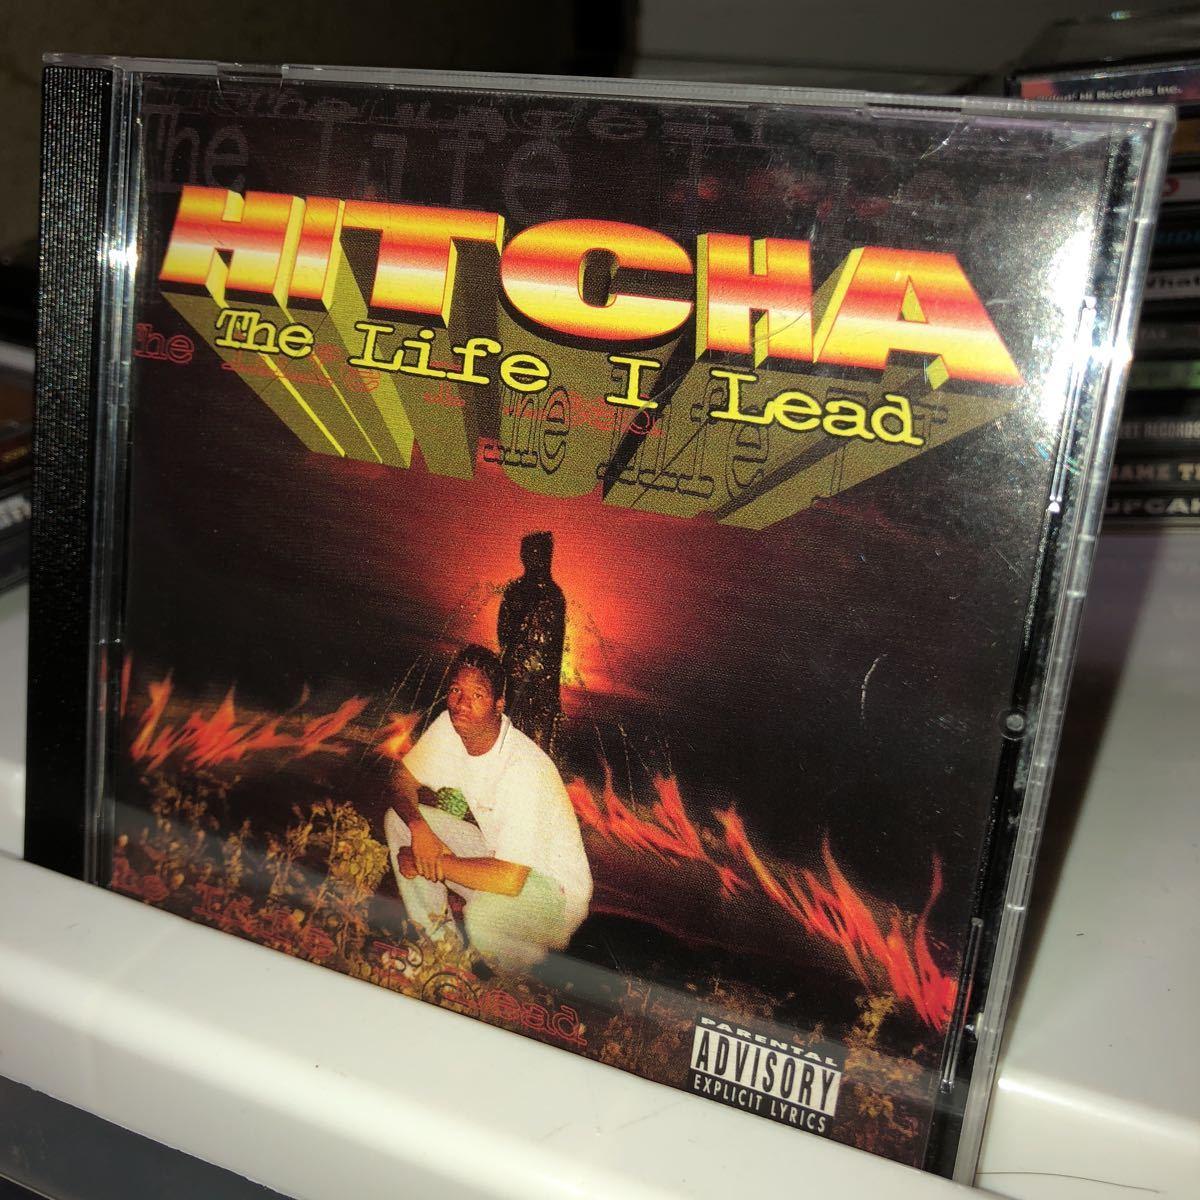 HITCHA「The Life I Lead」g-rap g-funk gangsta